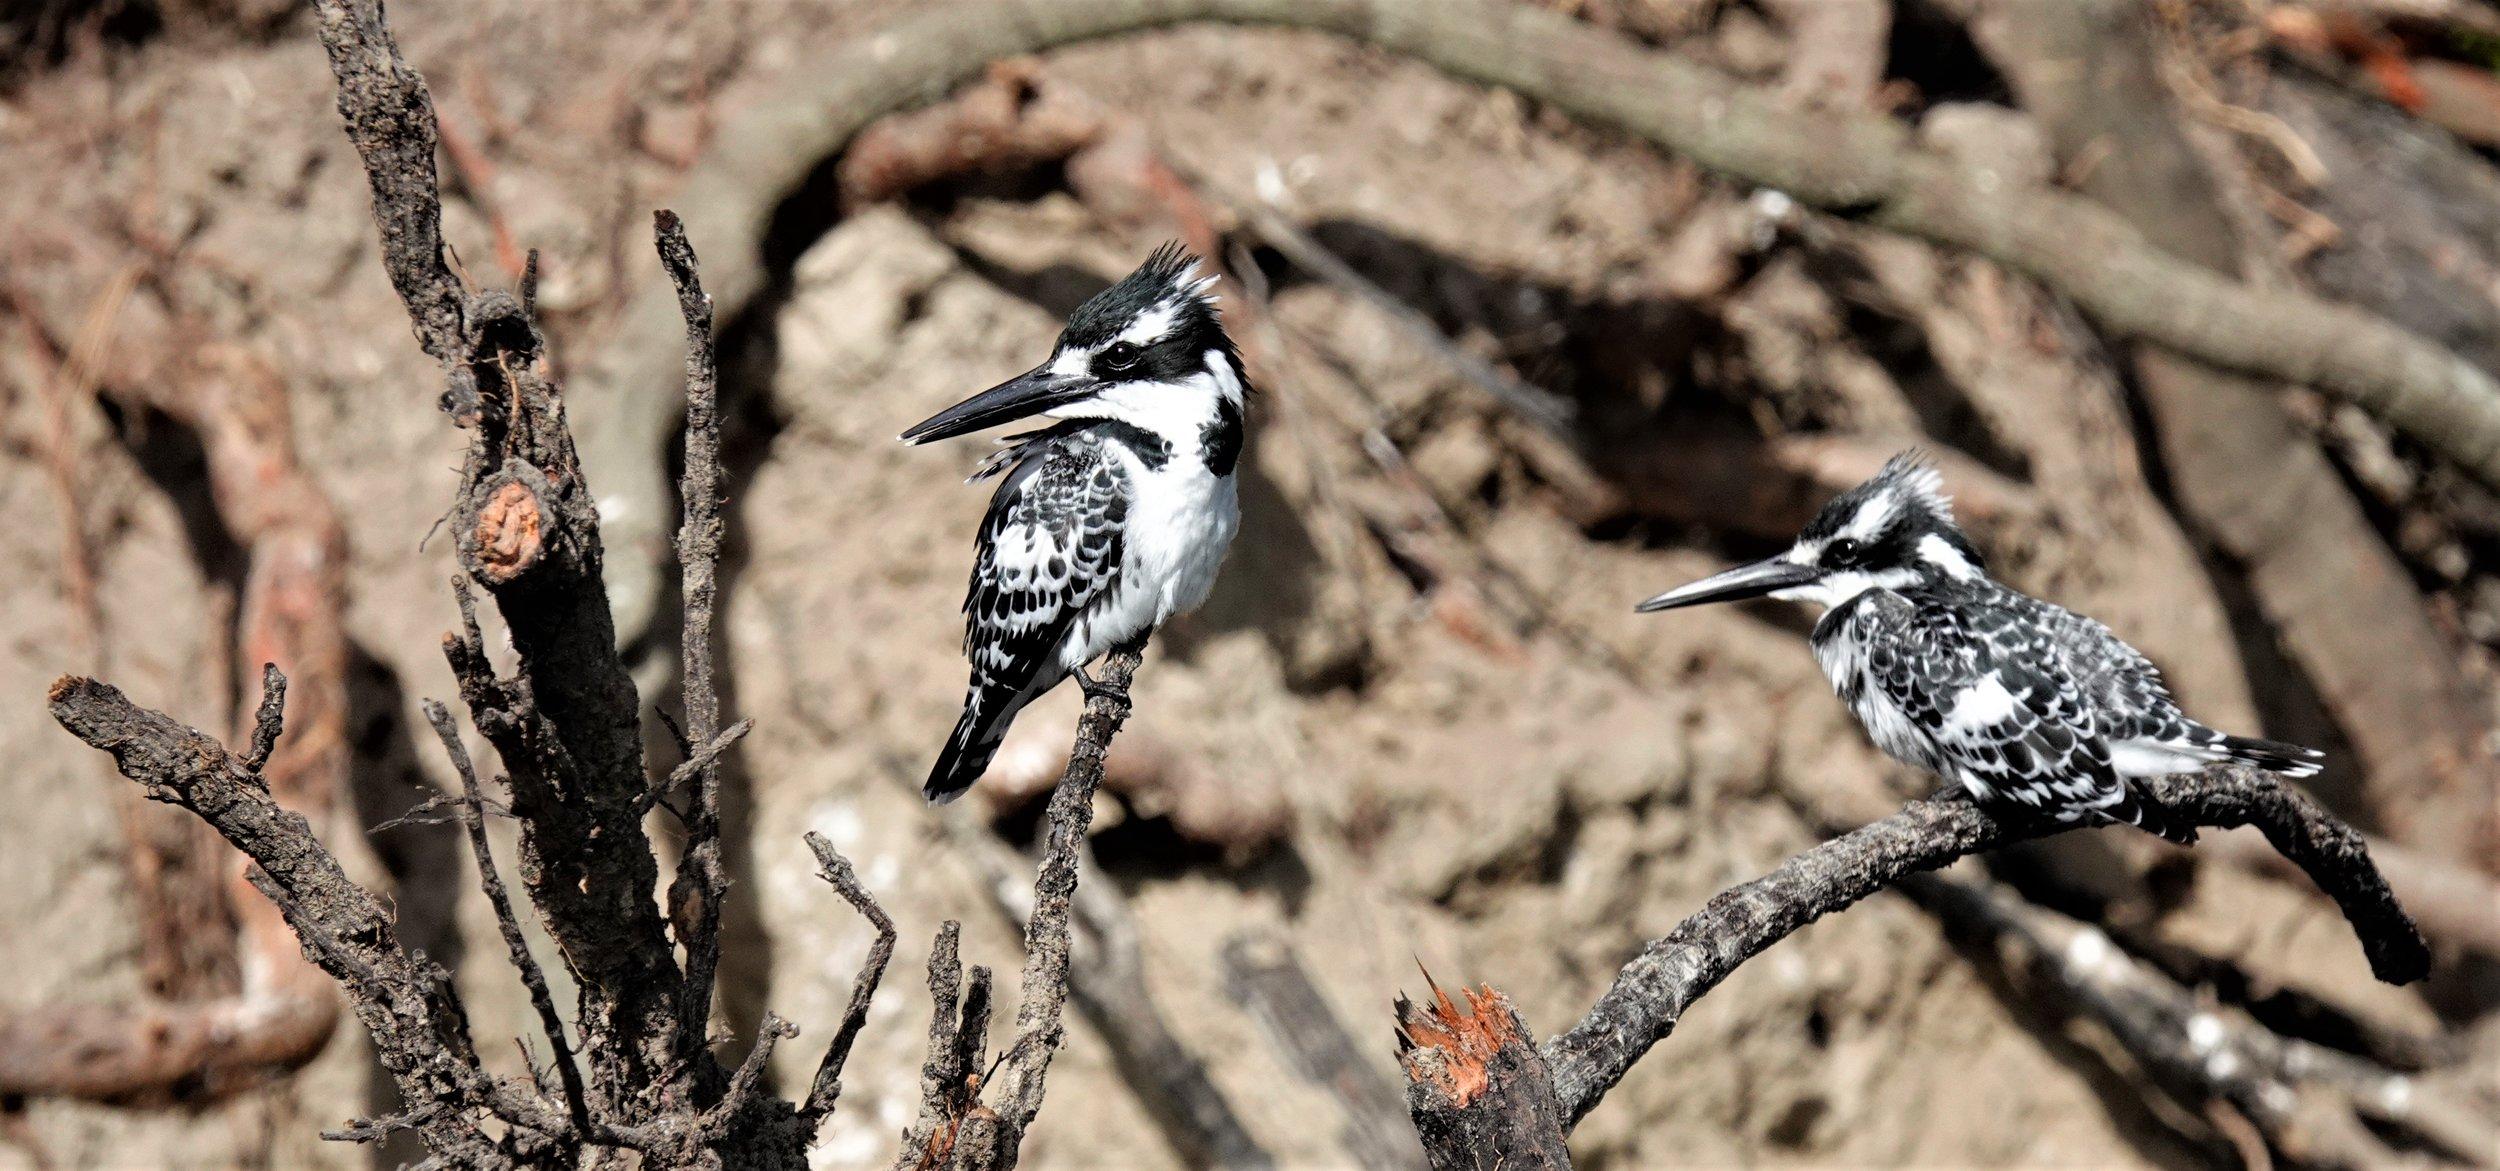 Setari Camp Botswana Birds.jpg